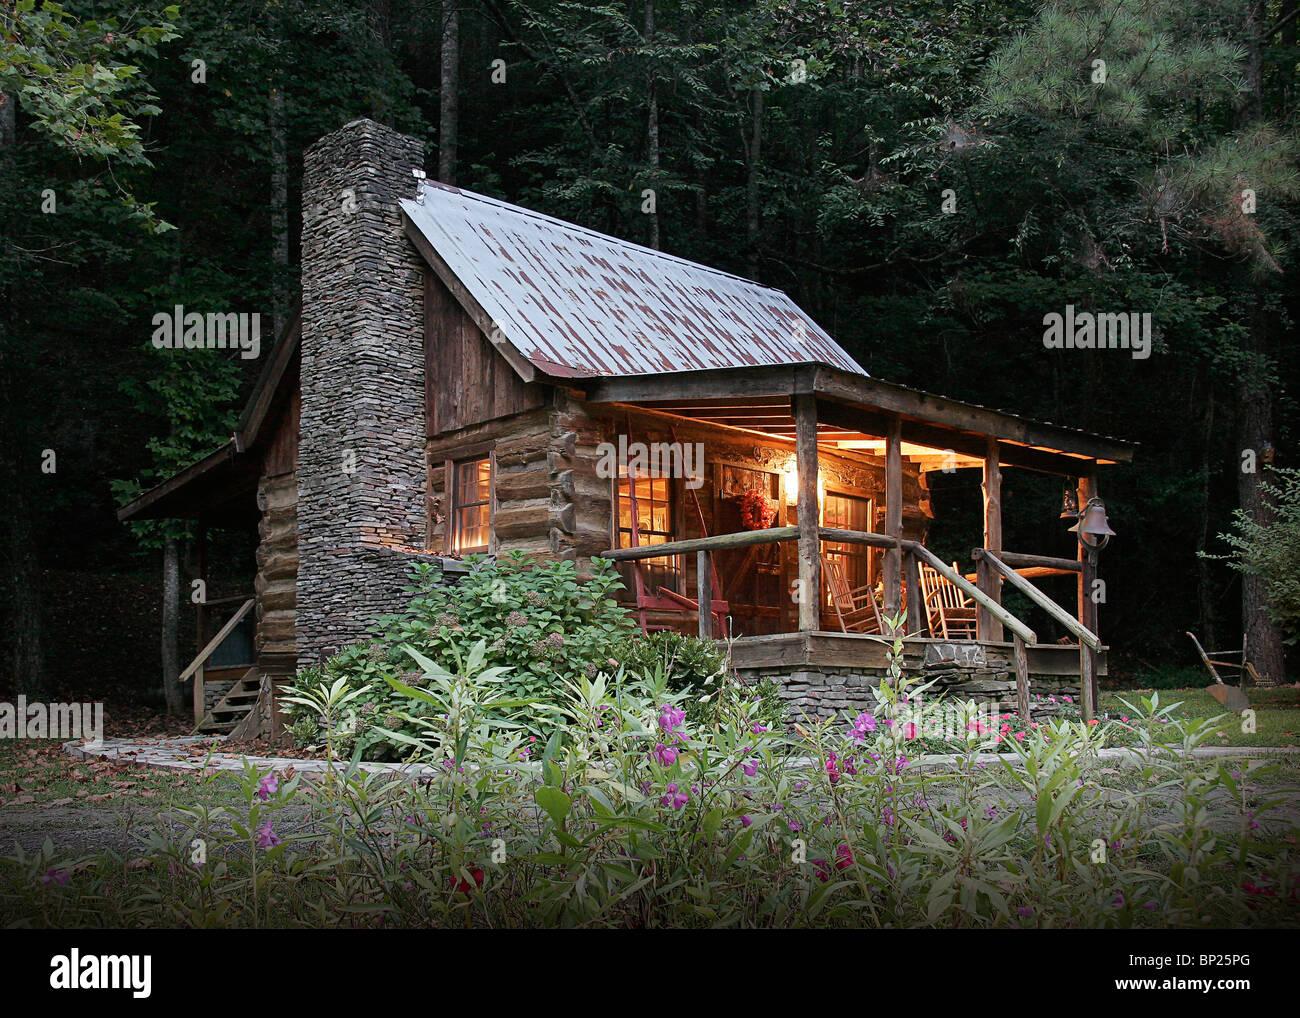 American Log Cabin Stock Photo 30781256 Alamy